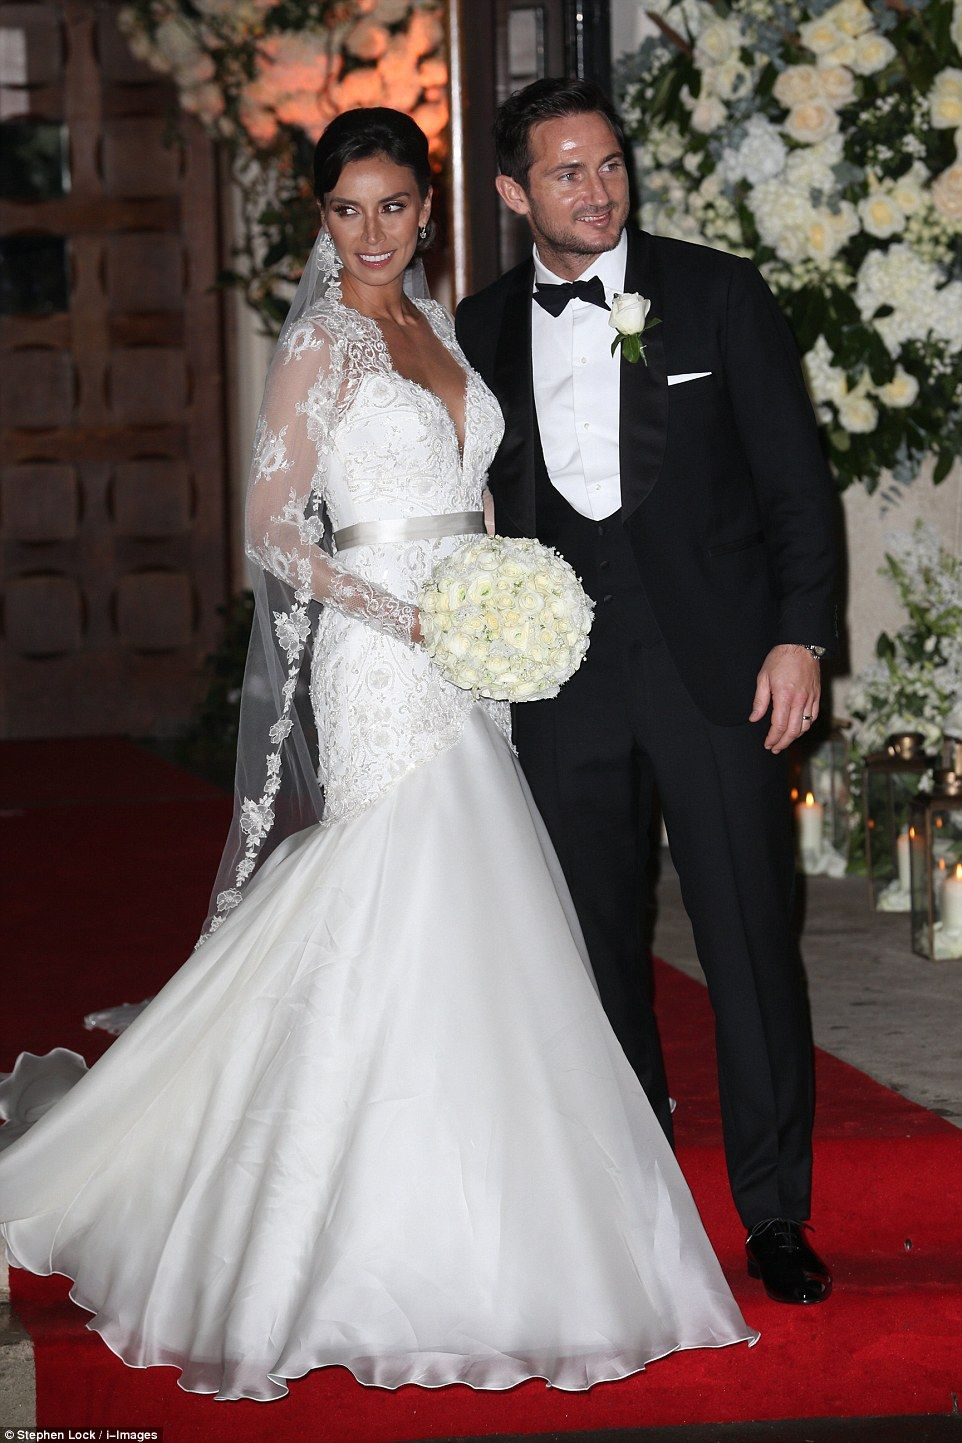 Celebrity weddings: news and photos - HELLO!